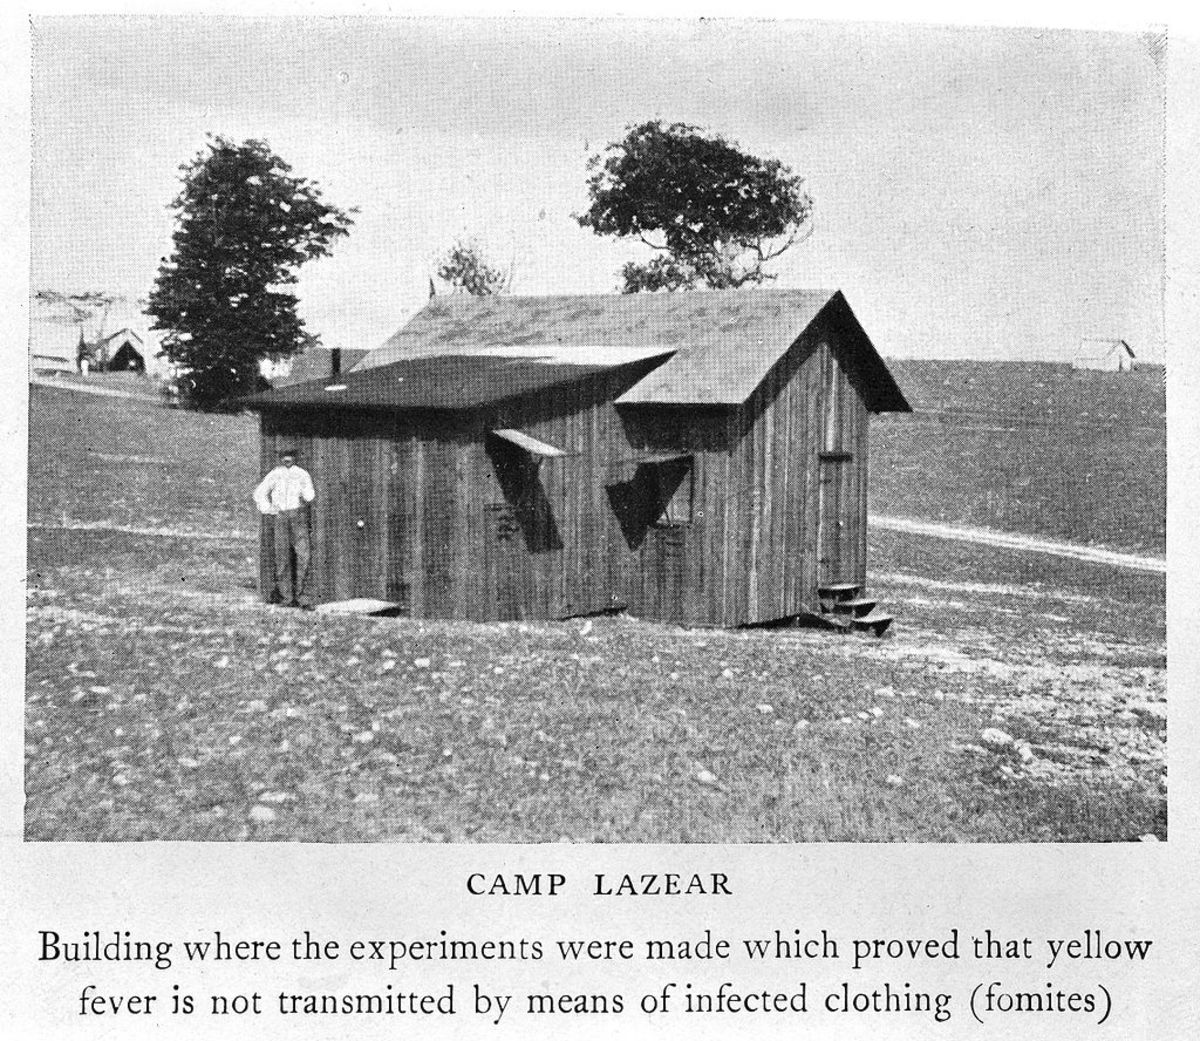 Camp Lazear